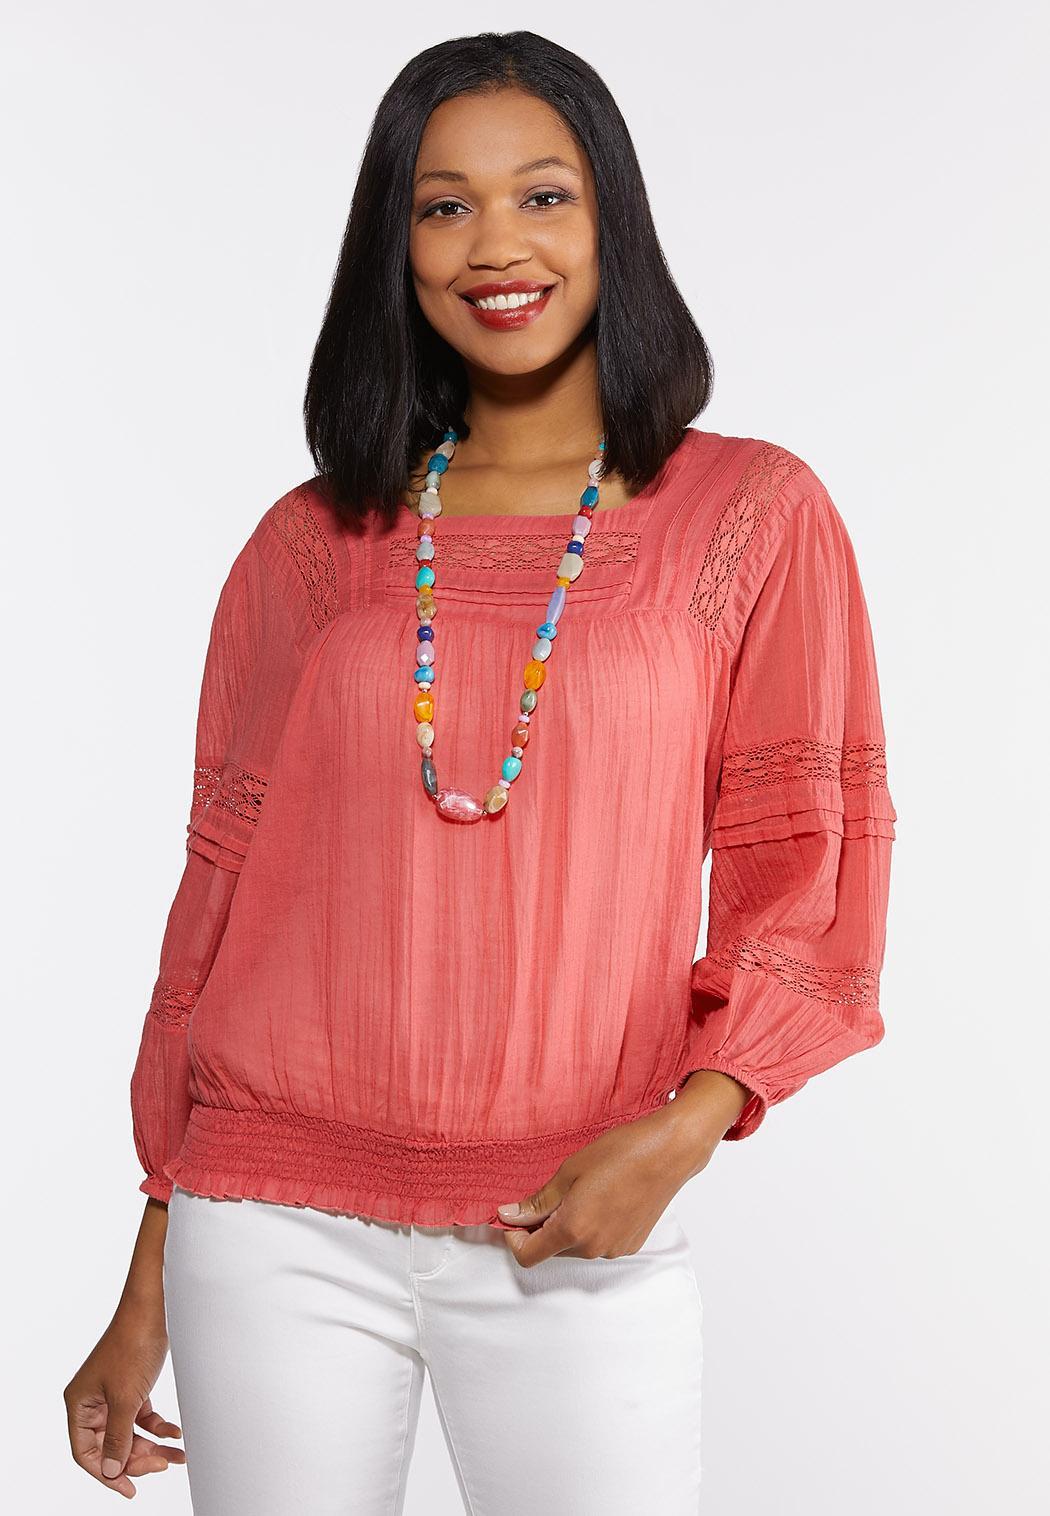 Brand New Sizes 18 Shirt 22 20 Authentic NEXT White//Cream Ladies Blouse